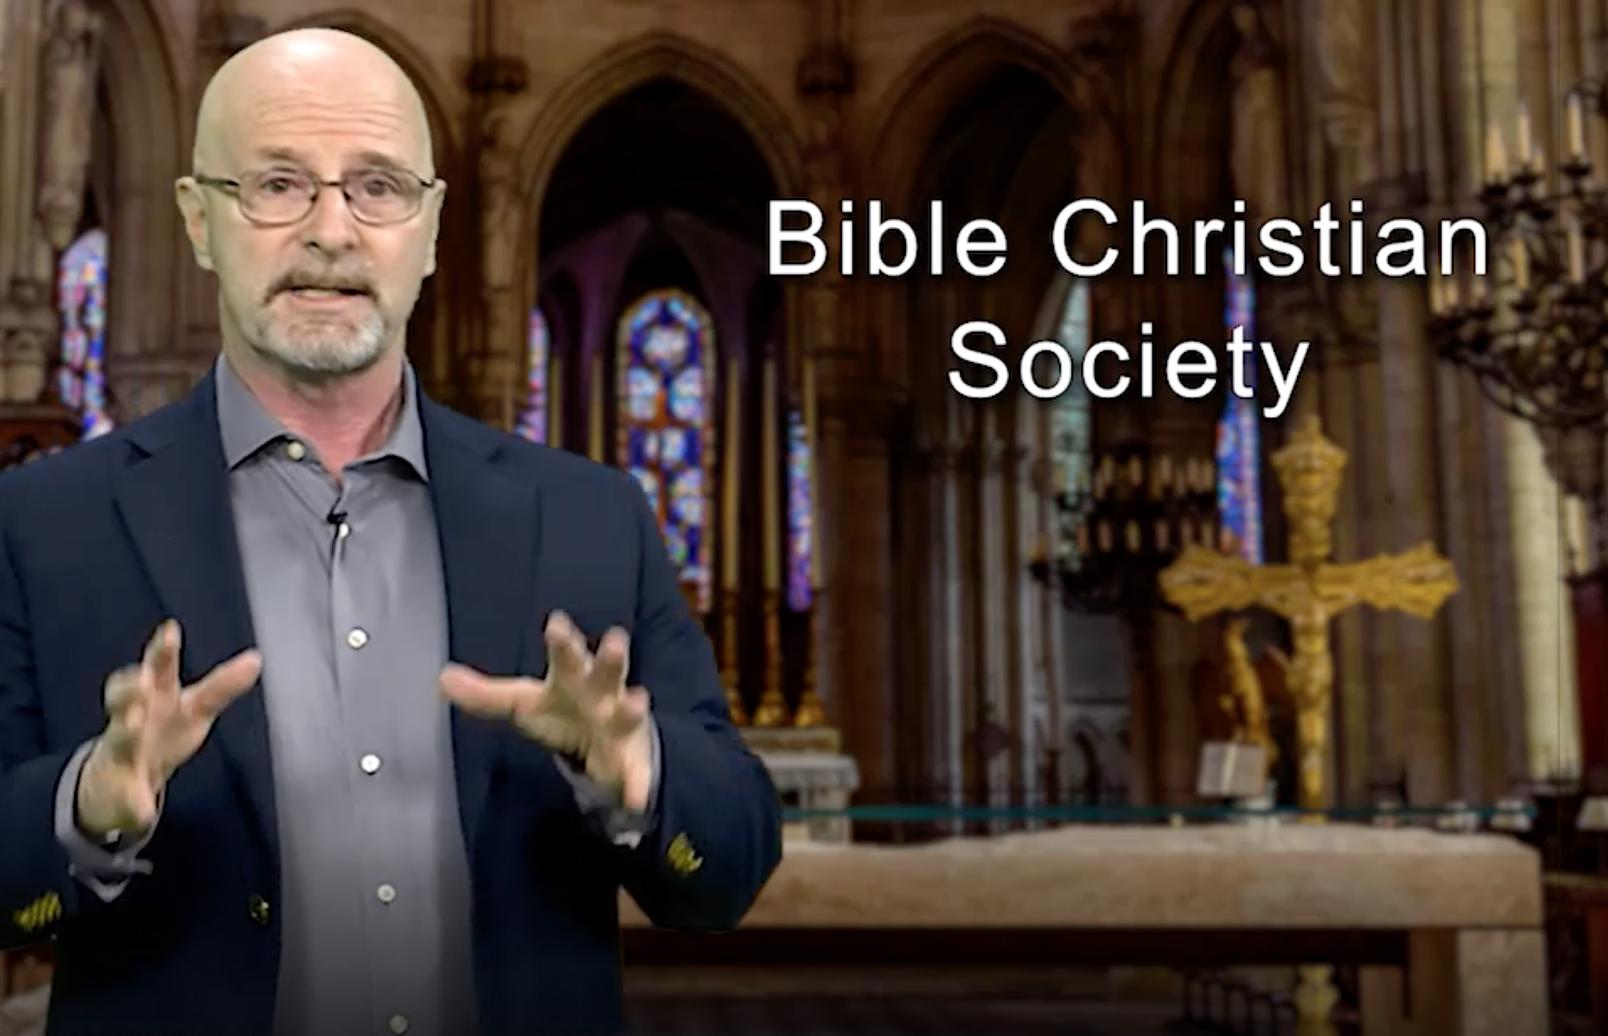 Bible Christian Society